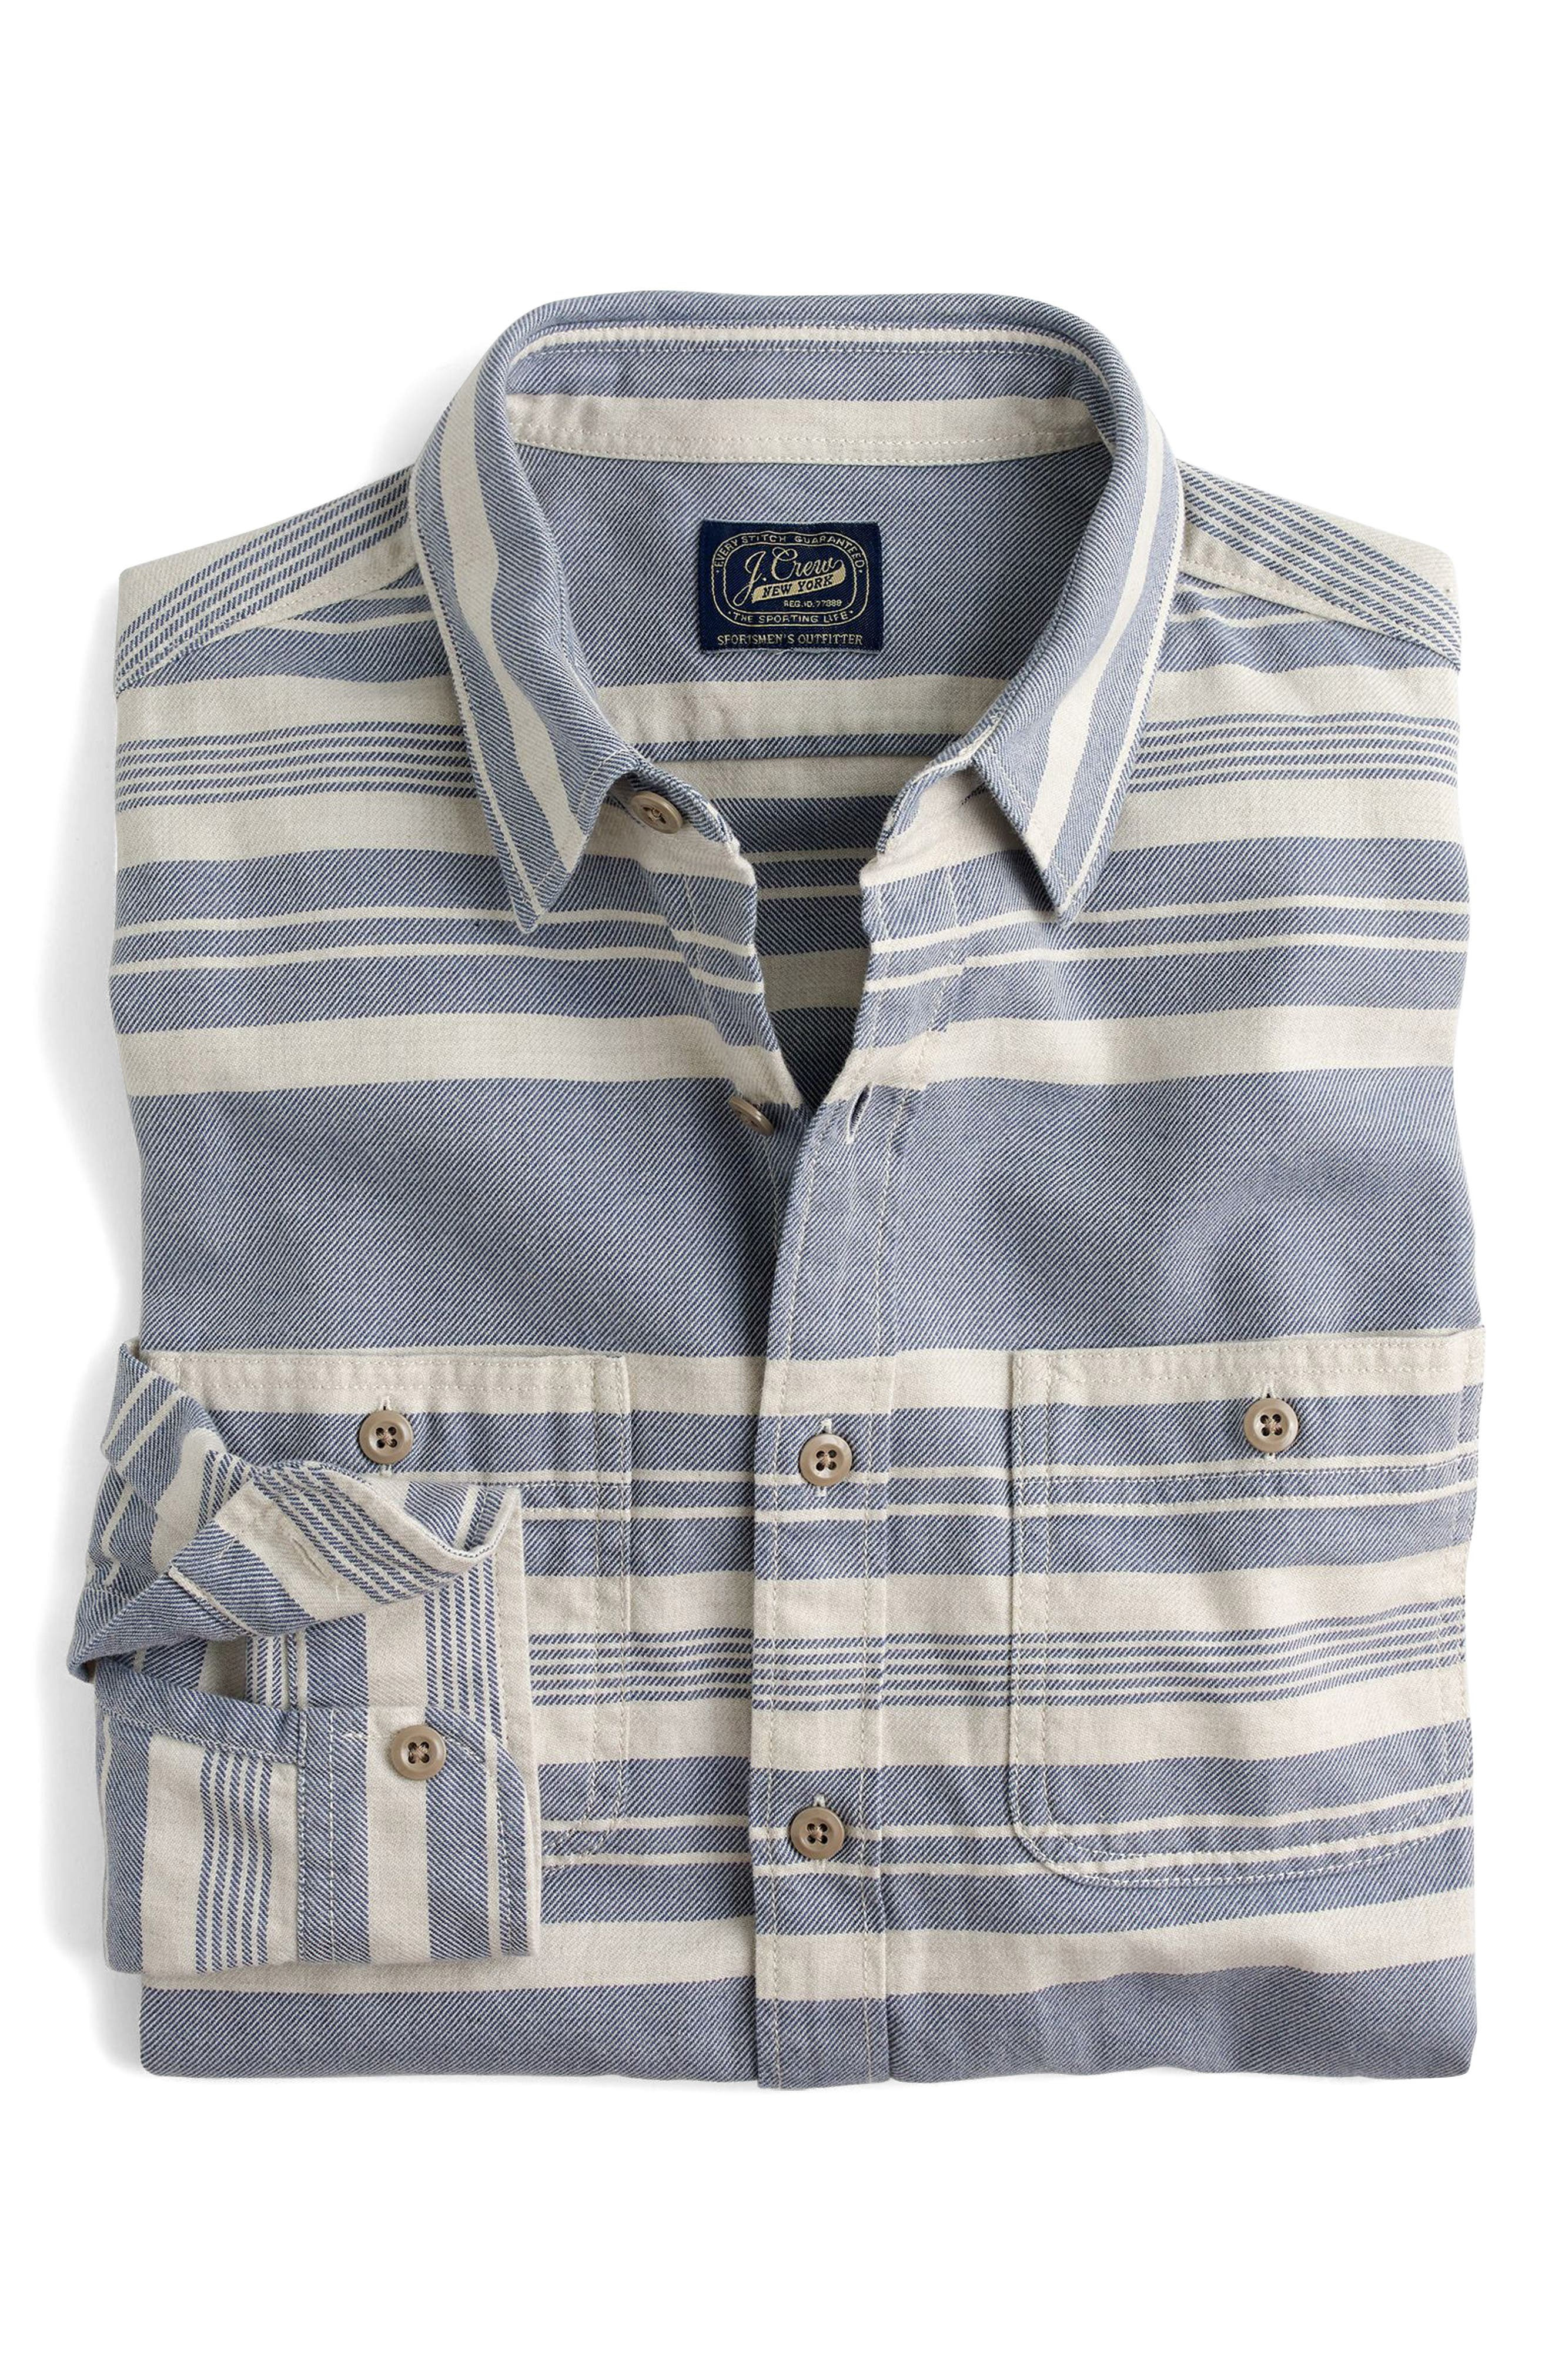 J.Crew Multistripe Flannel Work Shirt,                         Main,                         color, Concrete Sea